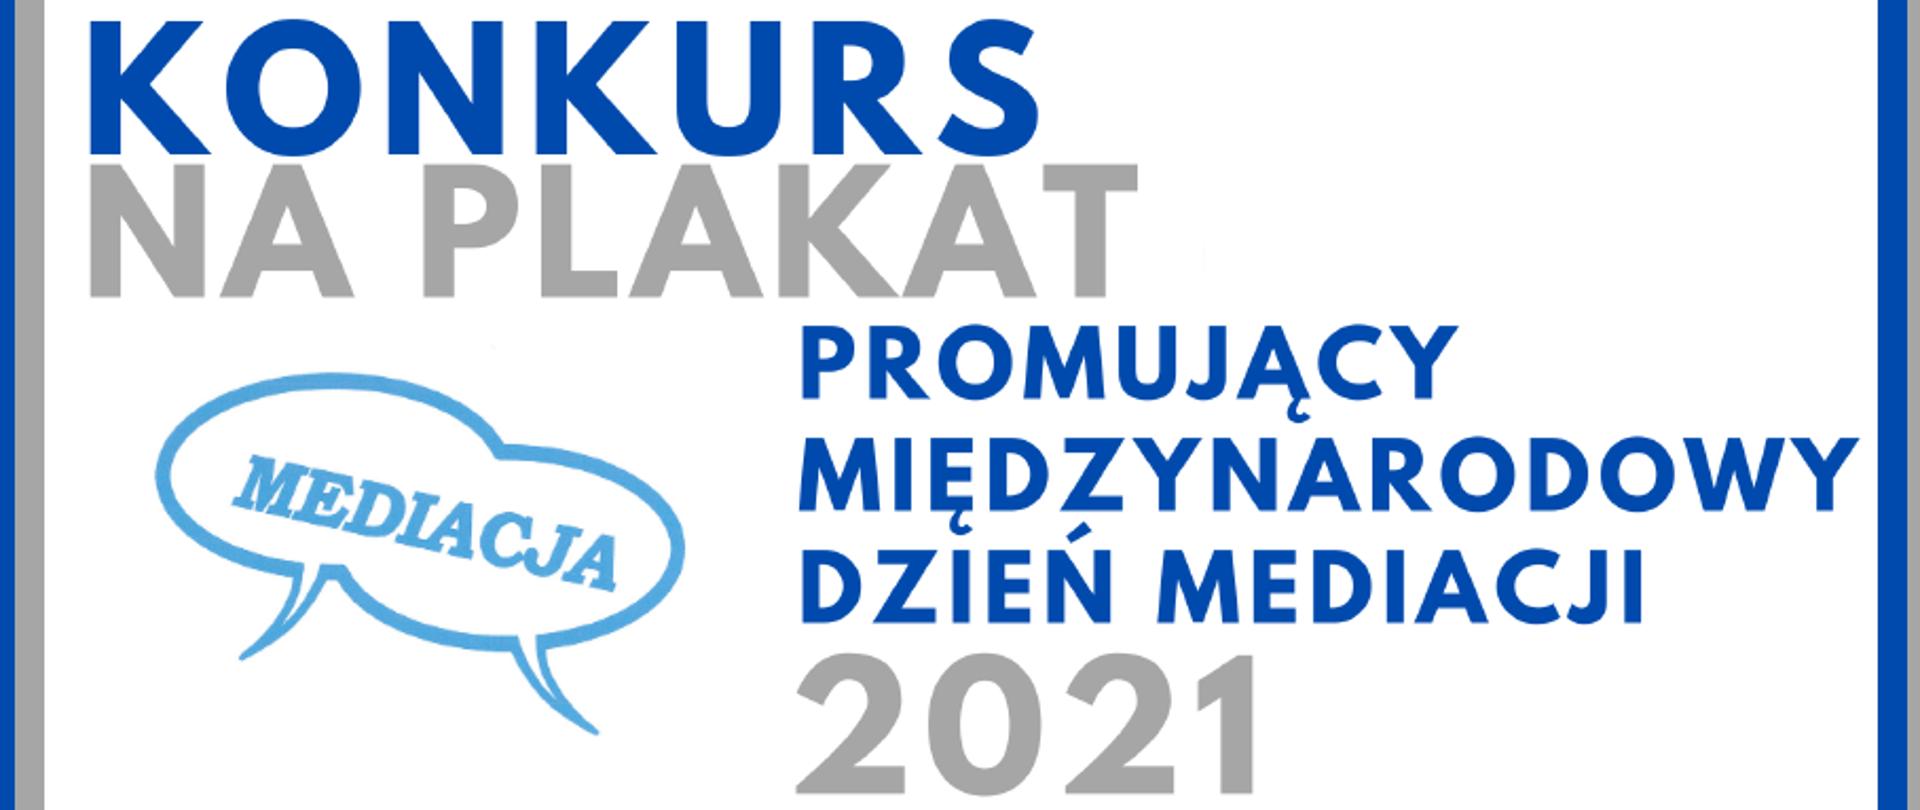 mediacja21